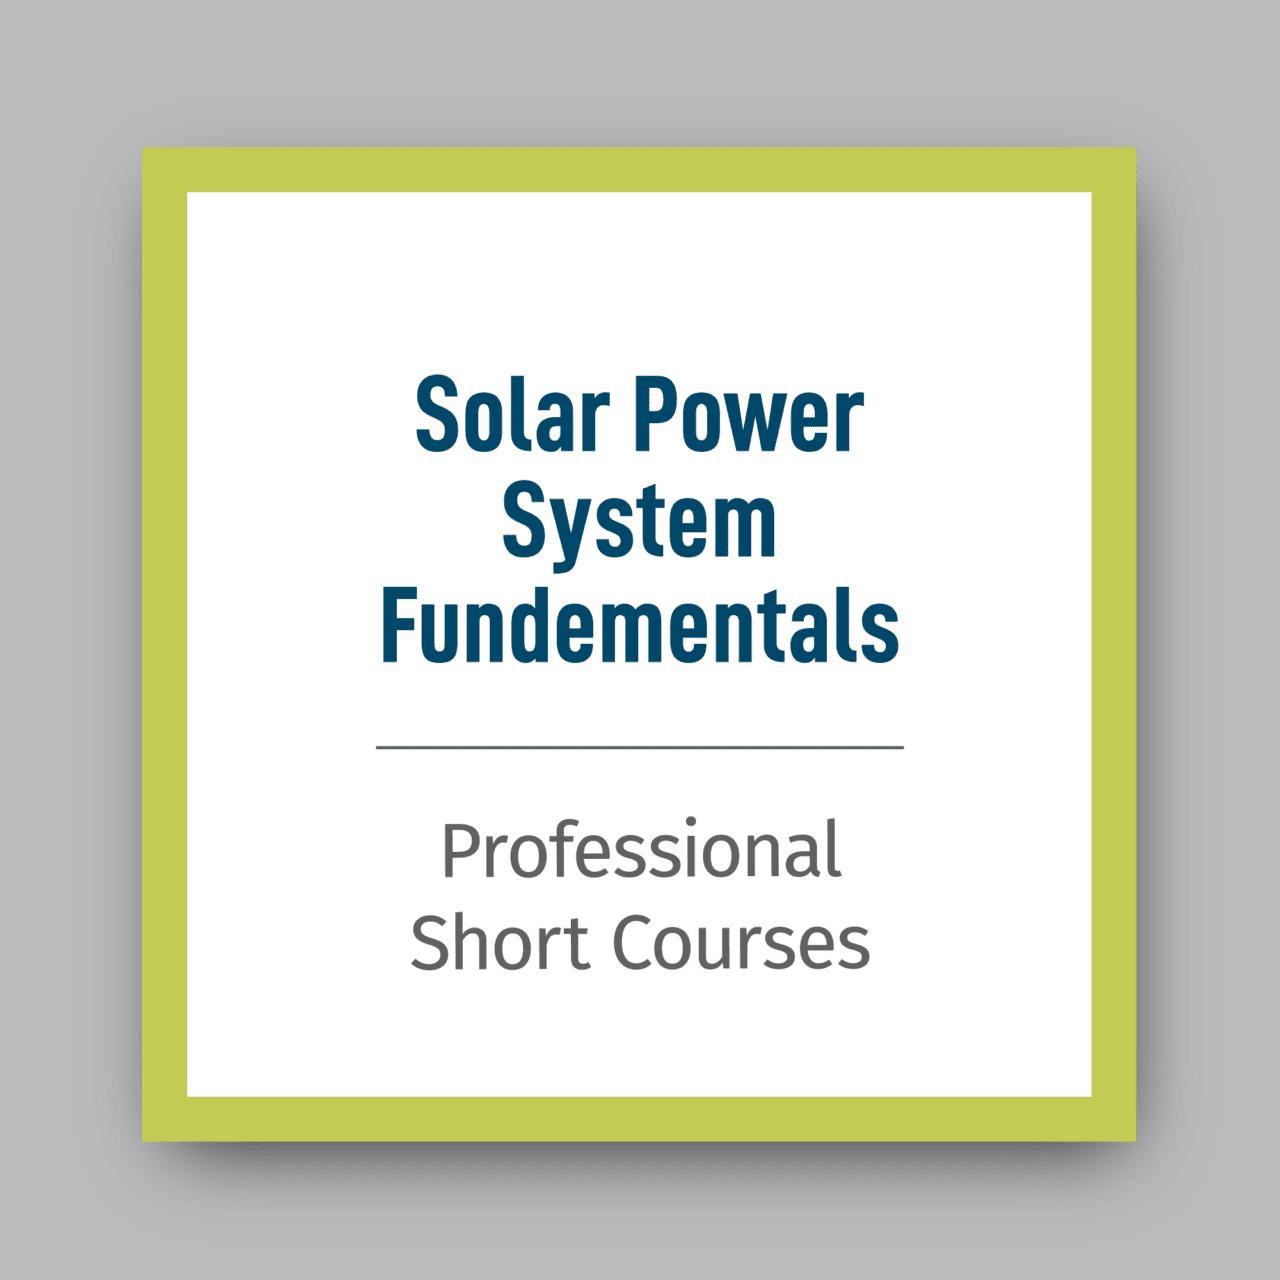 Solar-Power-System-Fundamentals-Pro-Short-Course